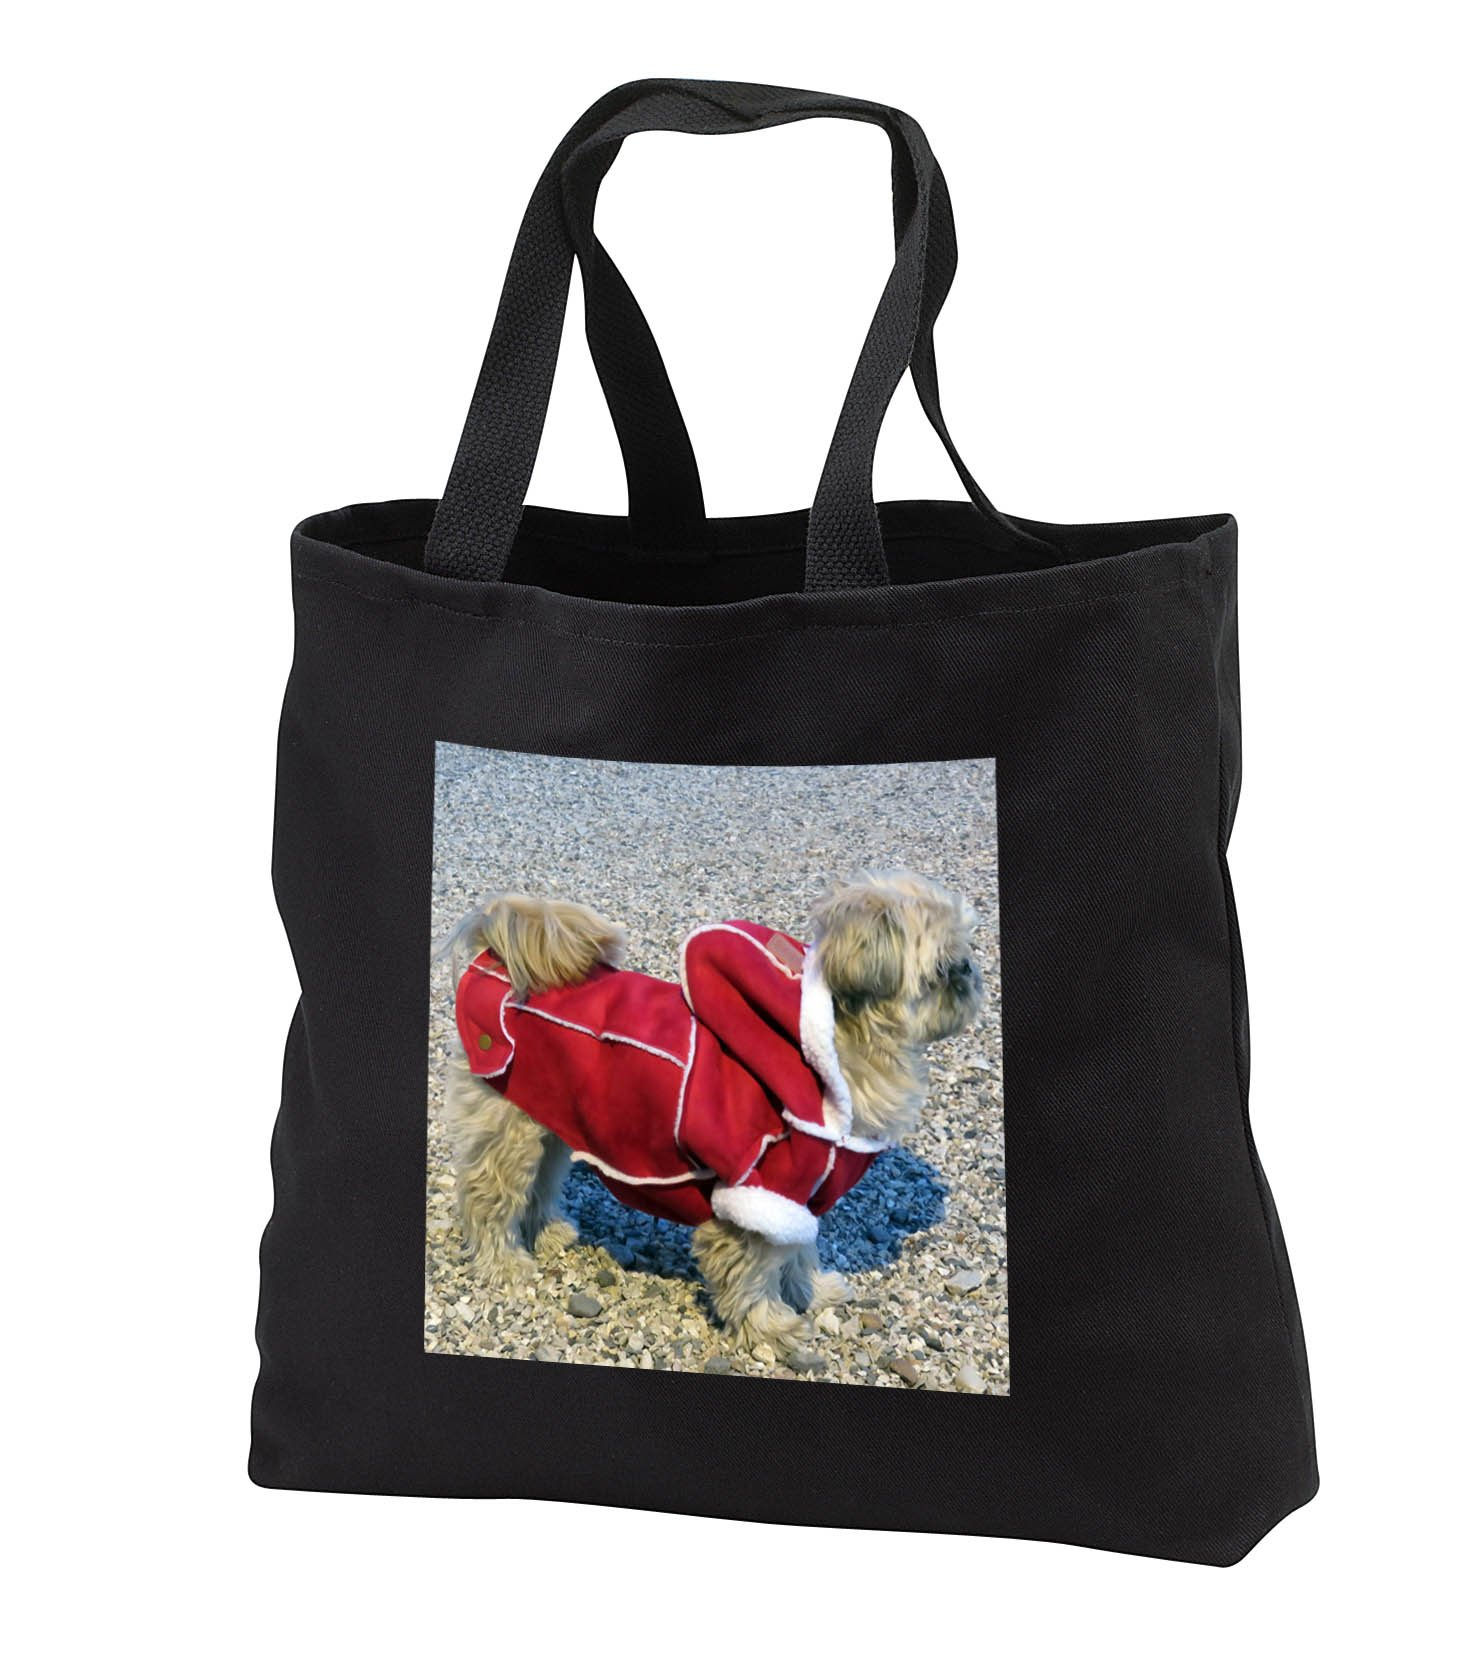 Jos Fauxtographee- Shih Tzu in Red Coat - An adorable Shih Tzu dog modeling her red winter coat - Tote Bags - Black Tote Bag JUMBO 20w x 15h x 5d (tb_284197_3)